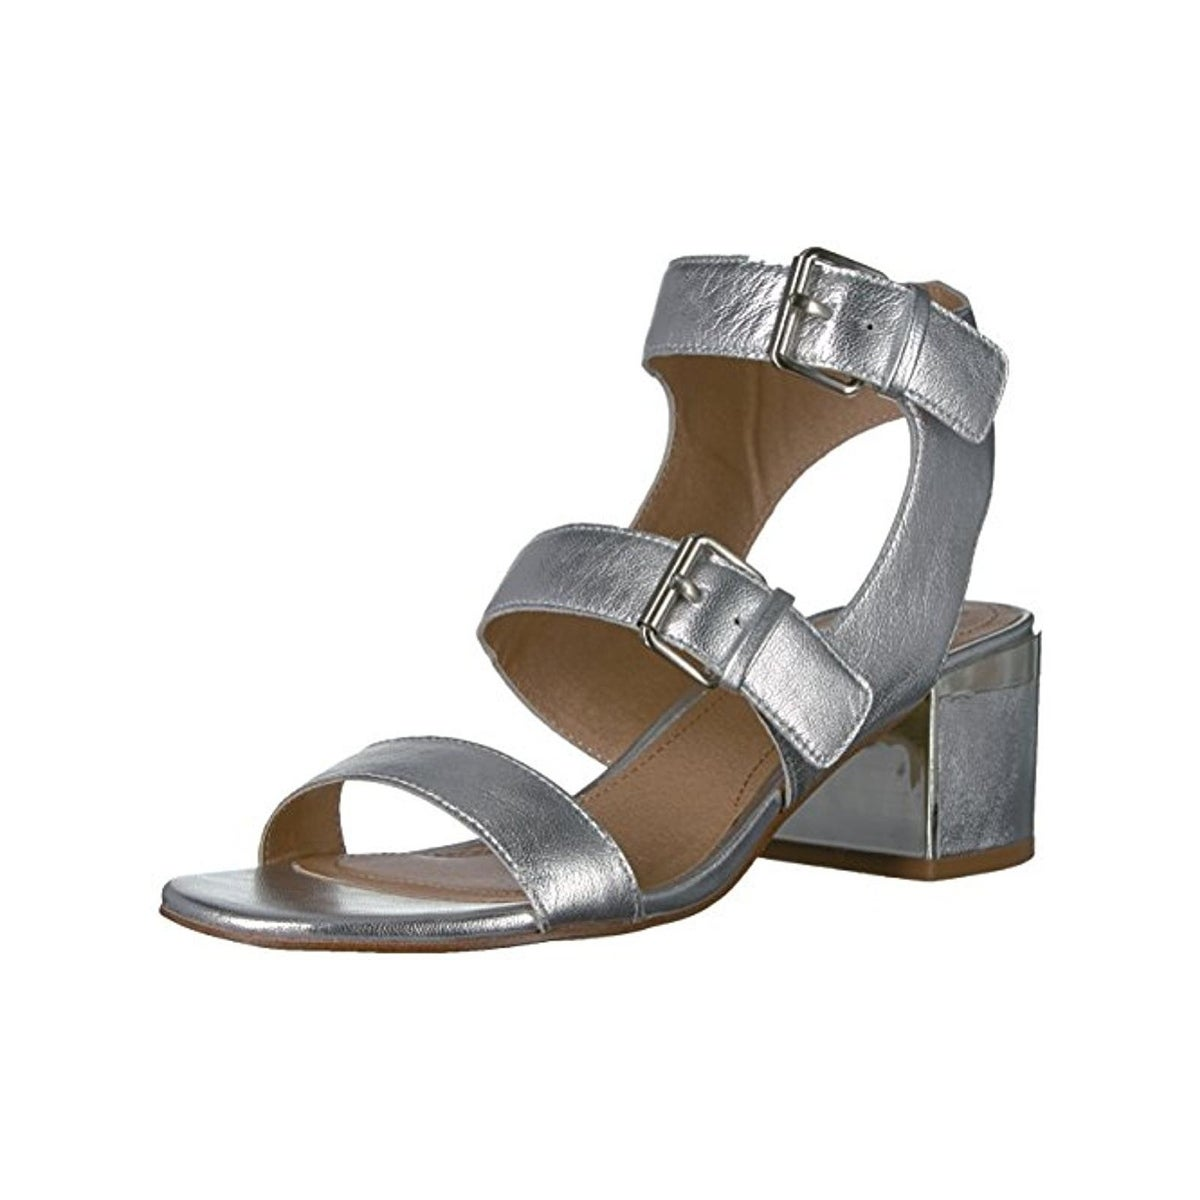 7b61d15c3ebd Tahari Women s Shoes